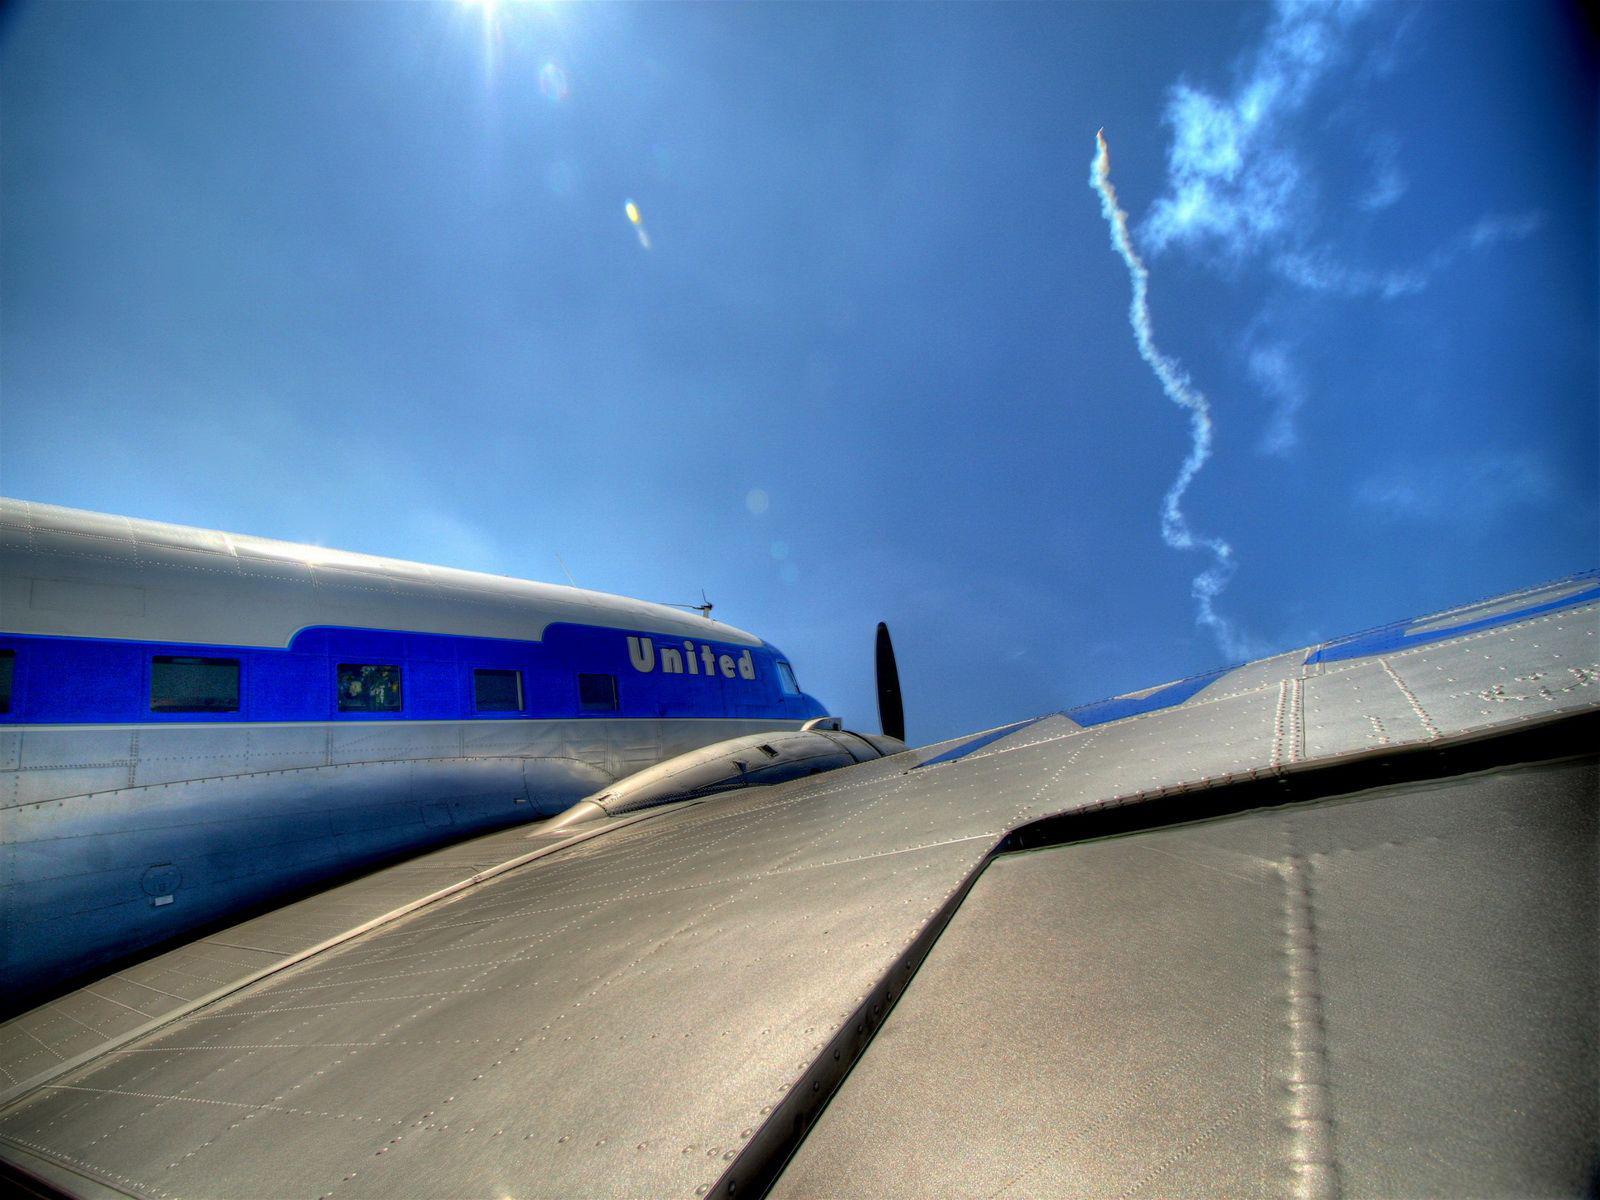 3d обои крыло самолета united самолеты